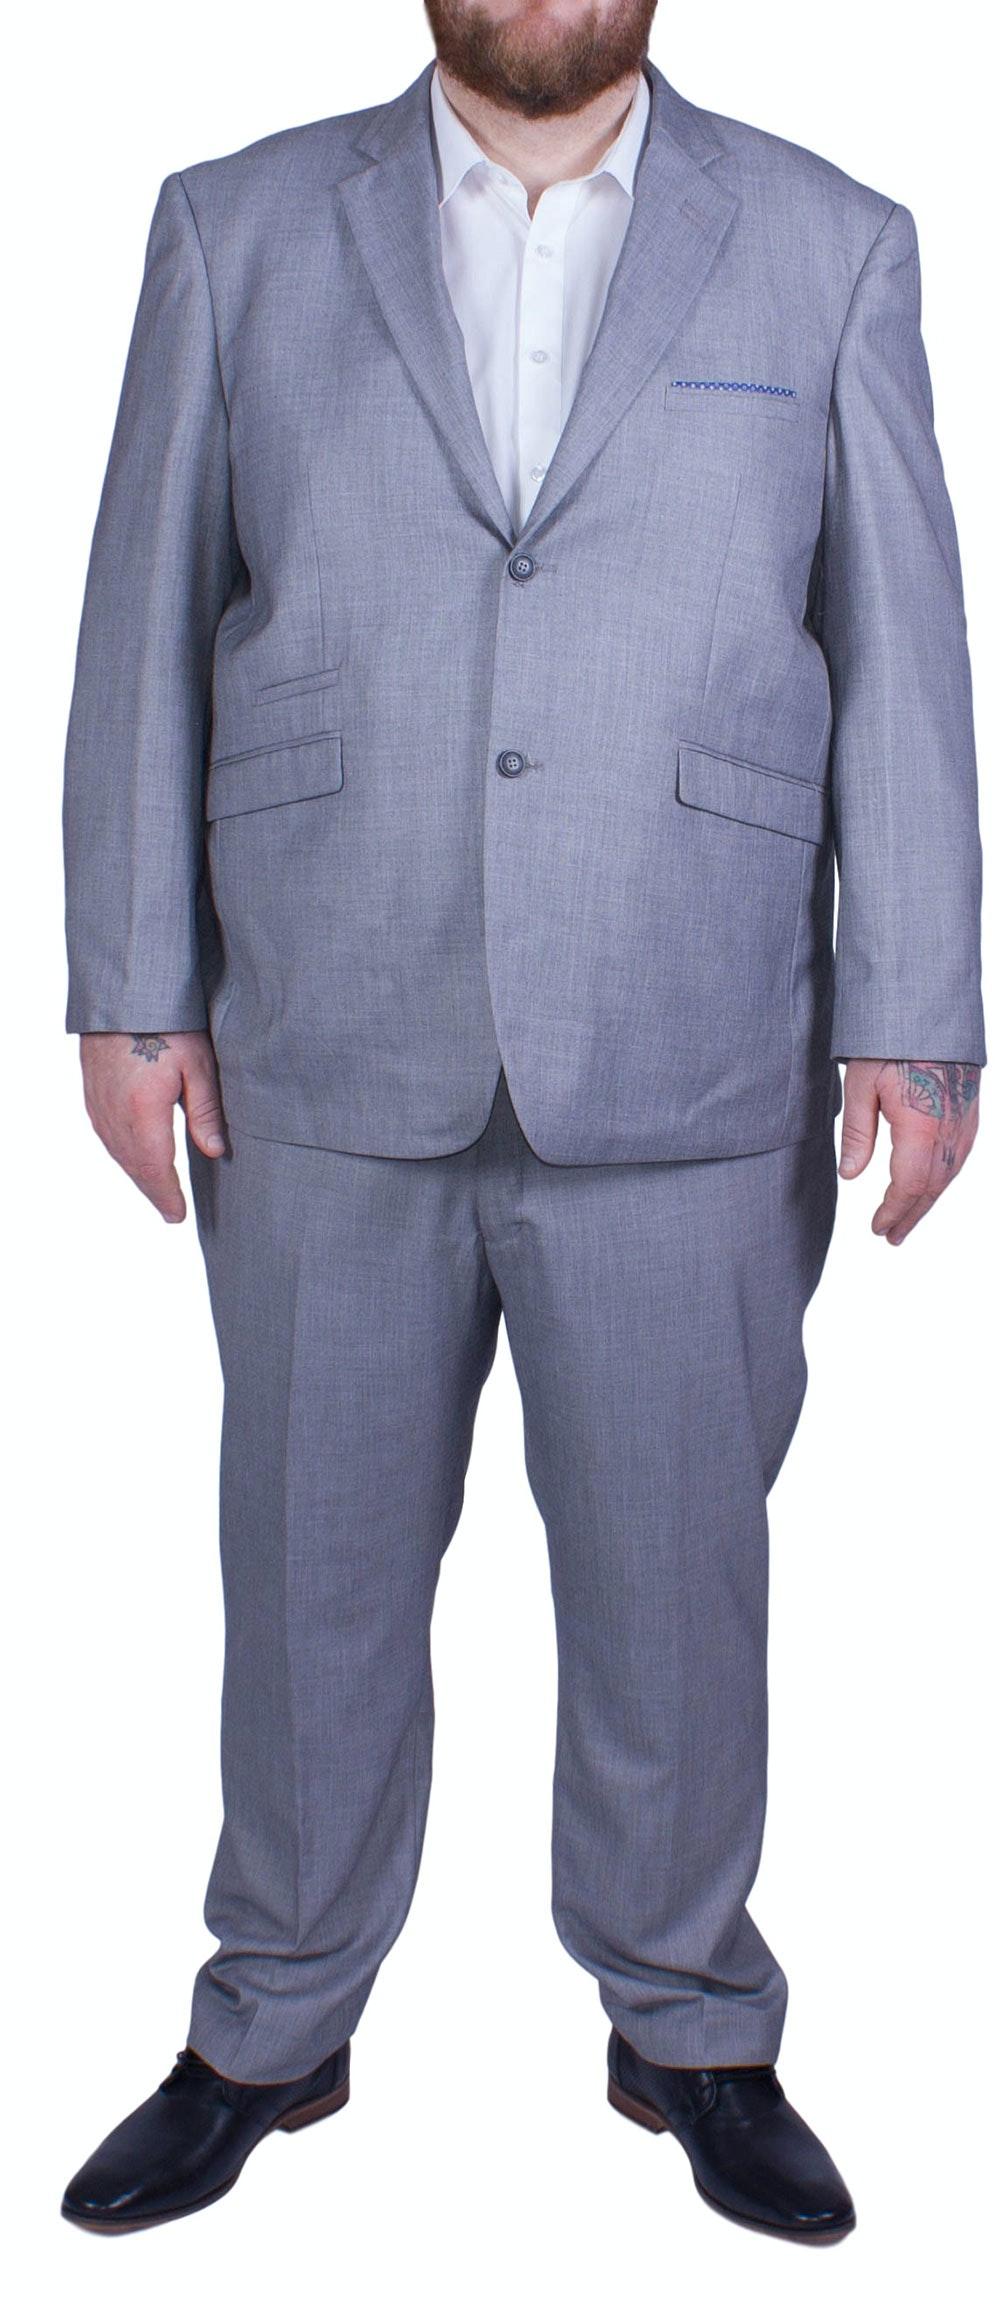 Kaymans Reegan Suit - Grey